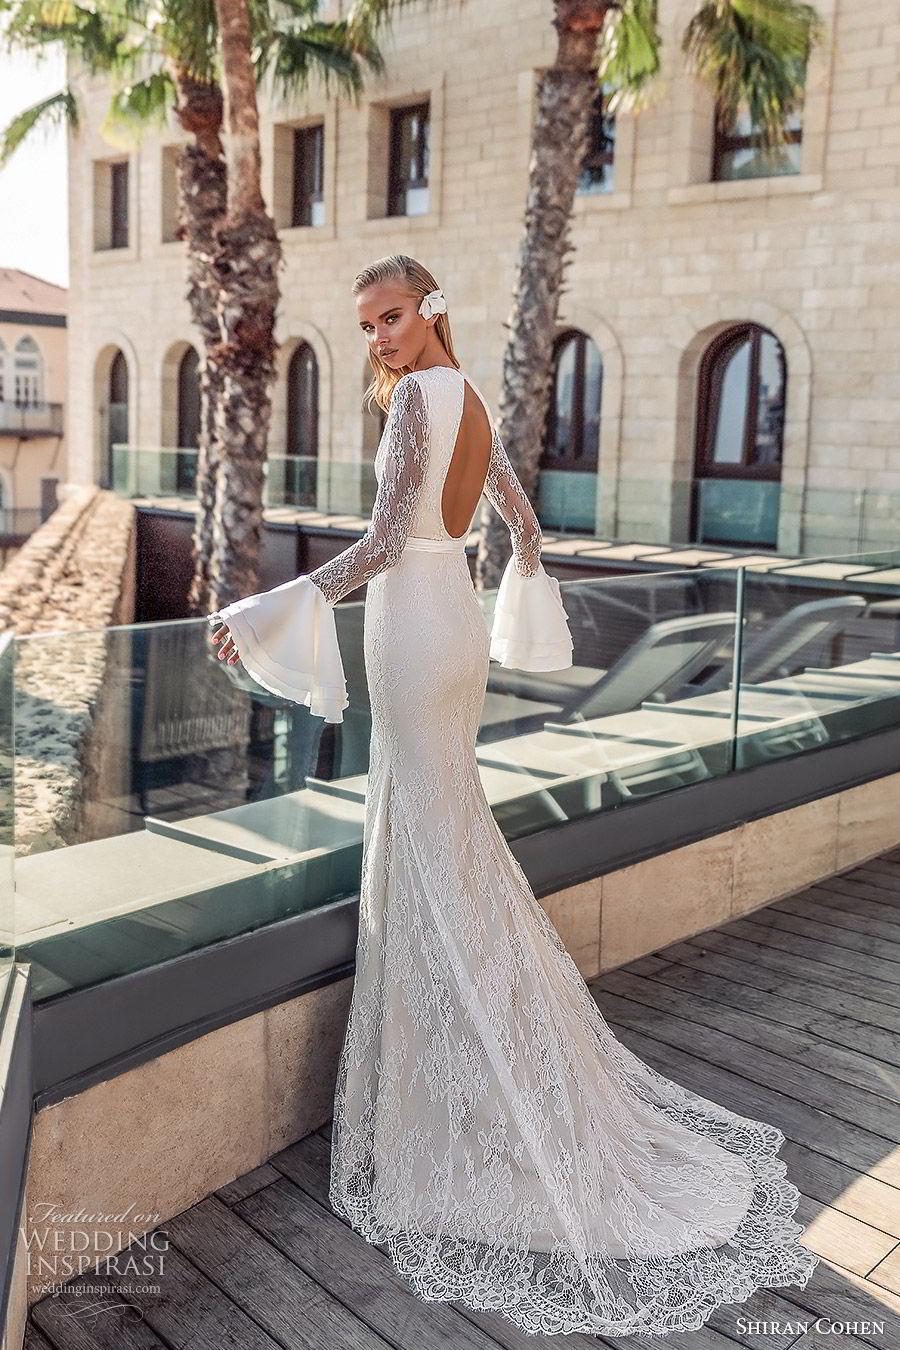 shiran cohen 2019 bridal long bell sleeves high neckline cutout bodice lace sheath trumpet wedding dress chapel train open back slit skirt sexy modern (3) bv